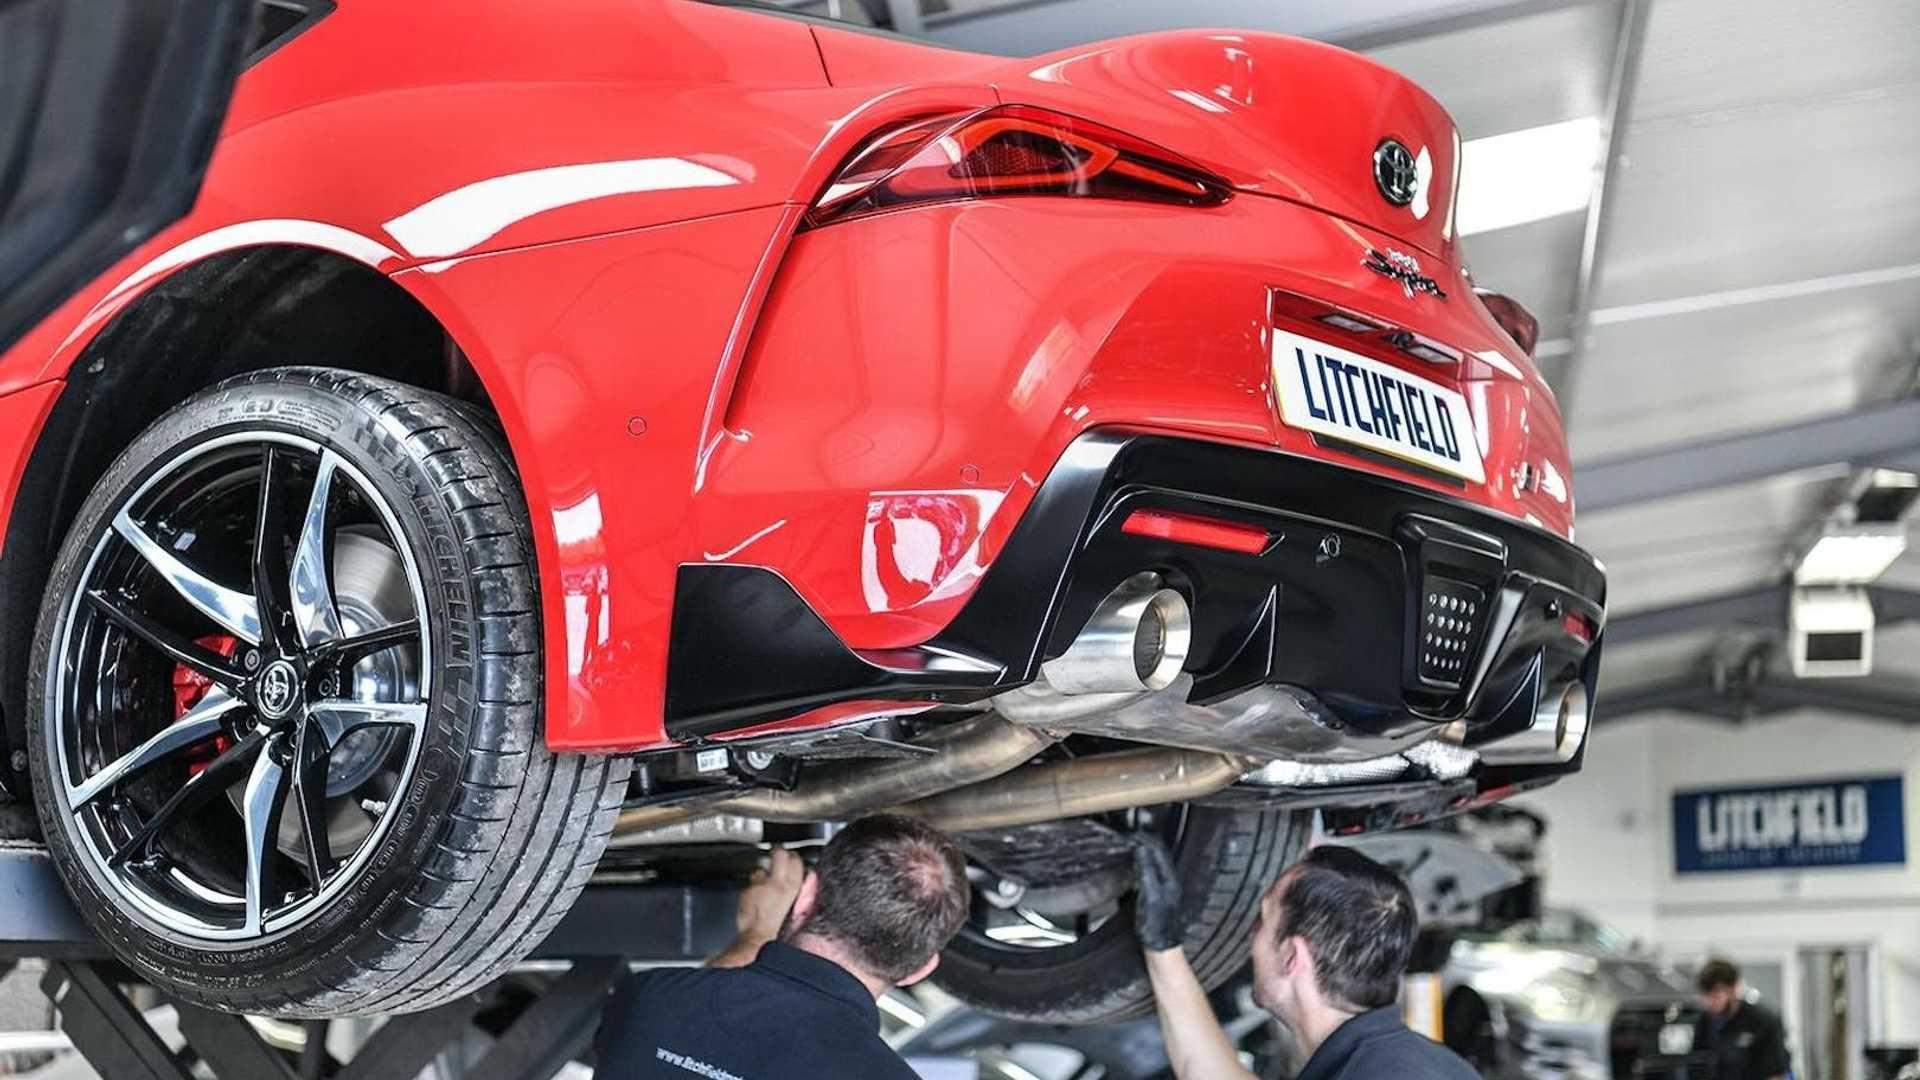 Litchfield Toyota Supra